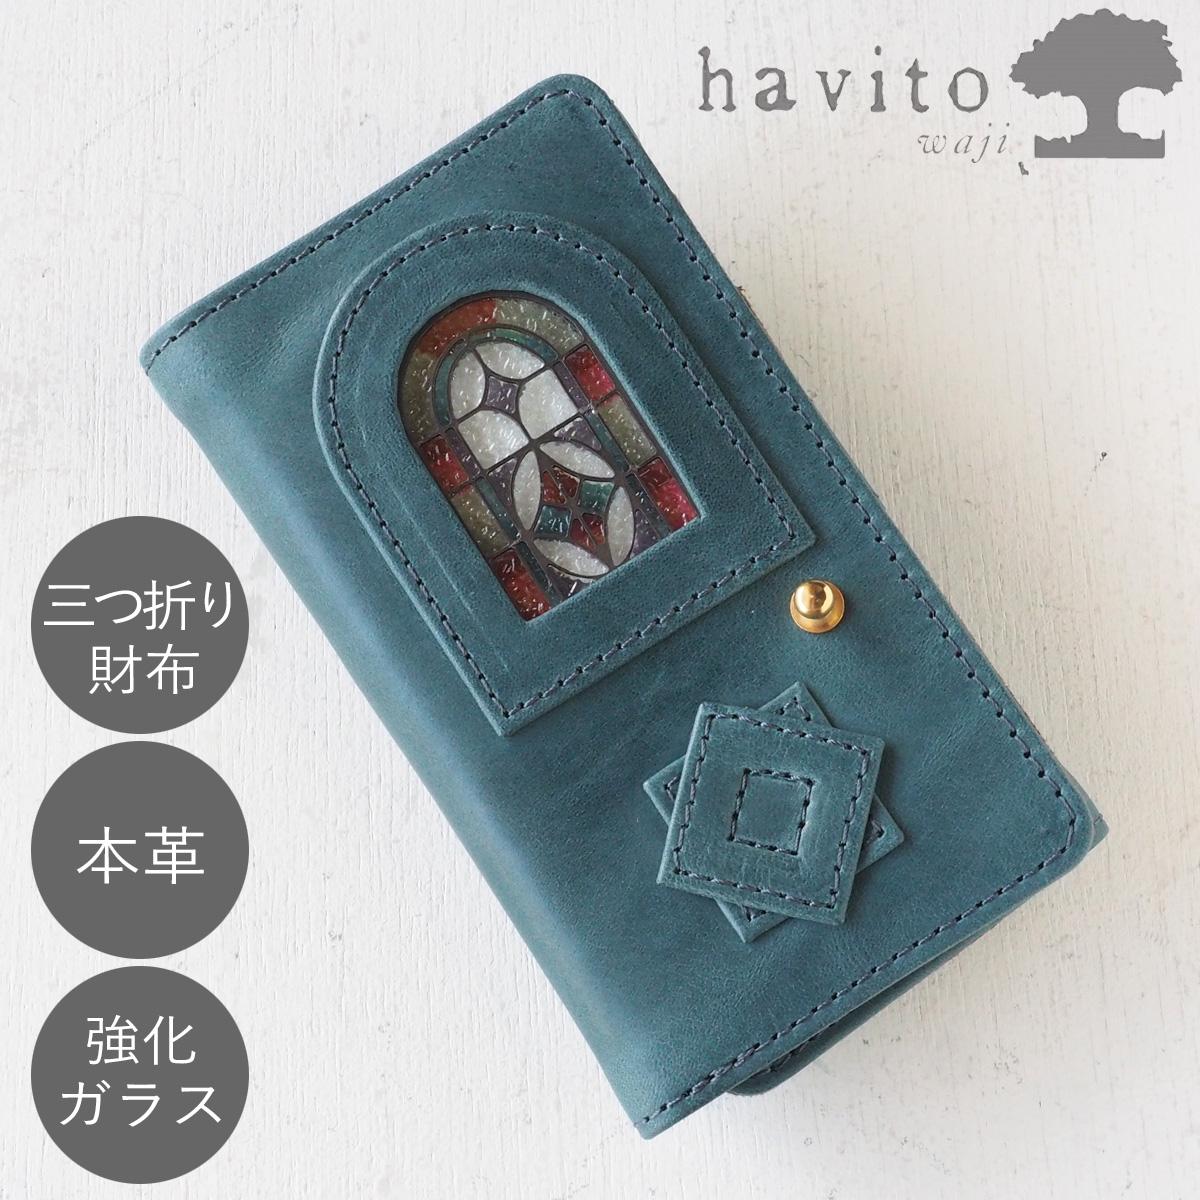 havito(ハビト) by waji(ワジ) glart 三つ折り財布 デザイン硝子×オイルレザー アンティークドア ネイビー [H0212-NV]